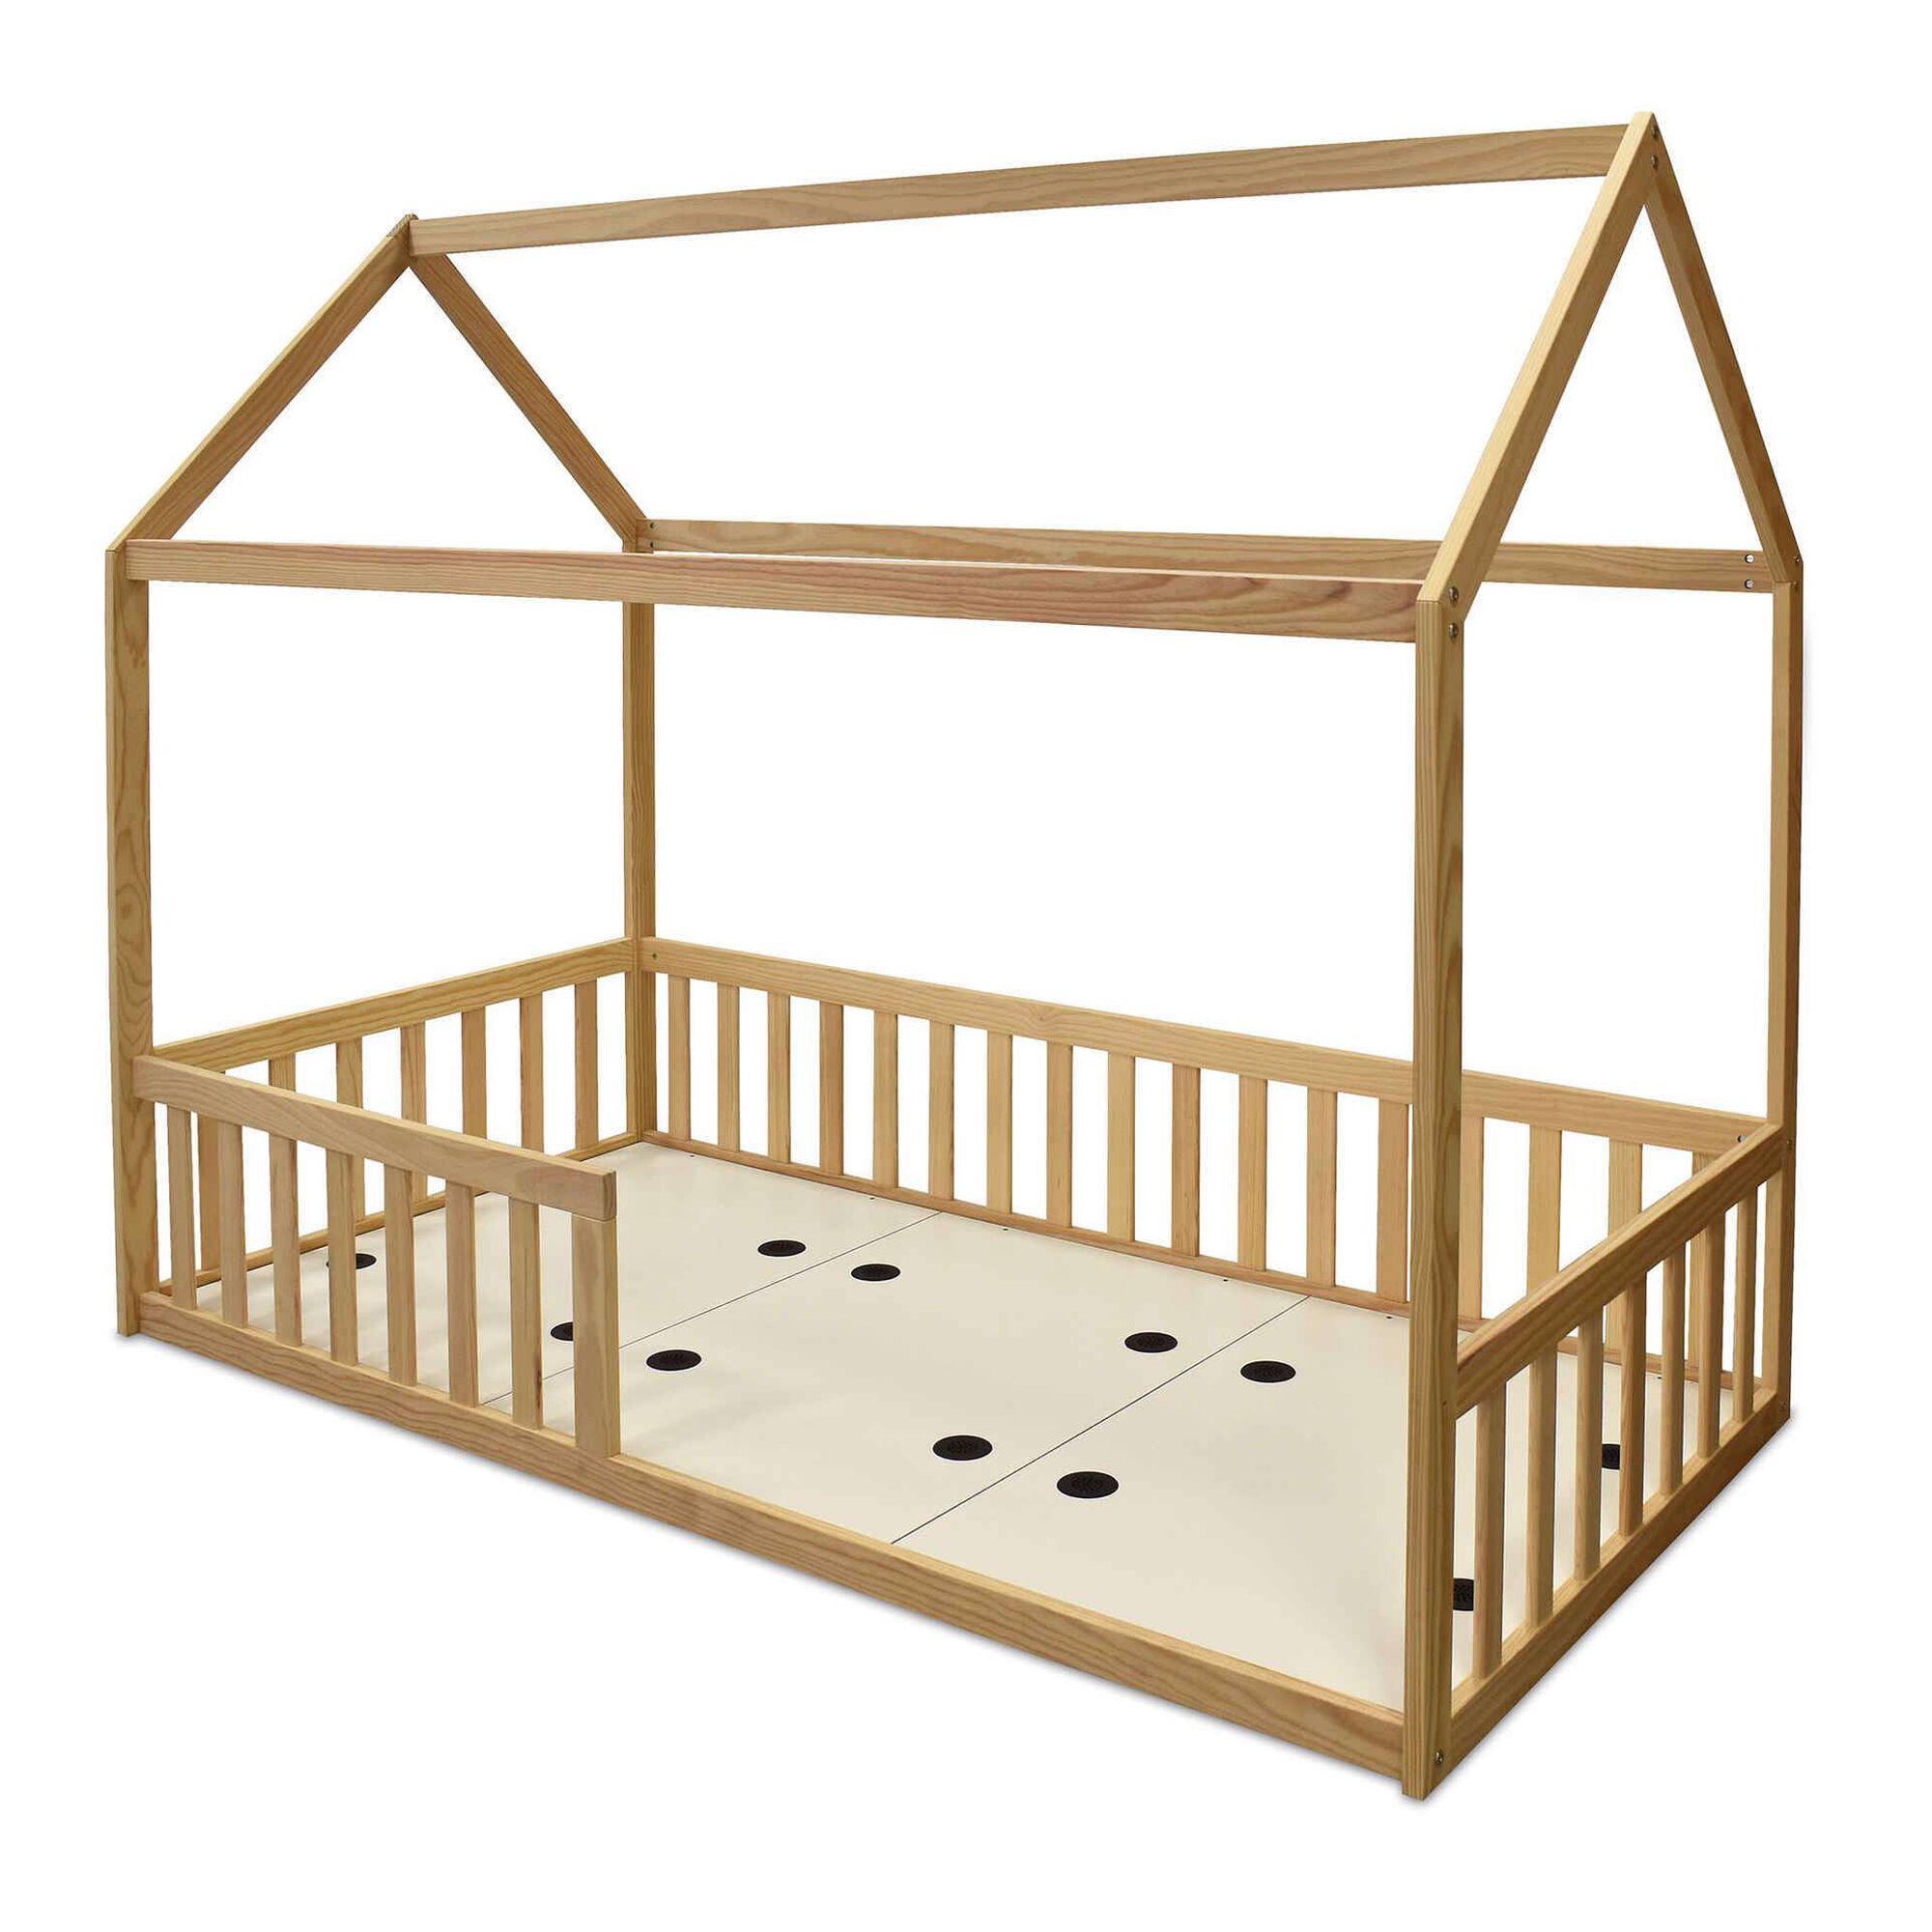 Cama Tenda Madeira Montessori